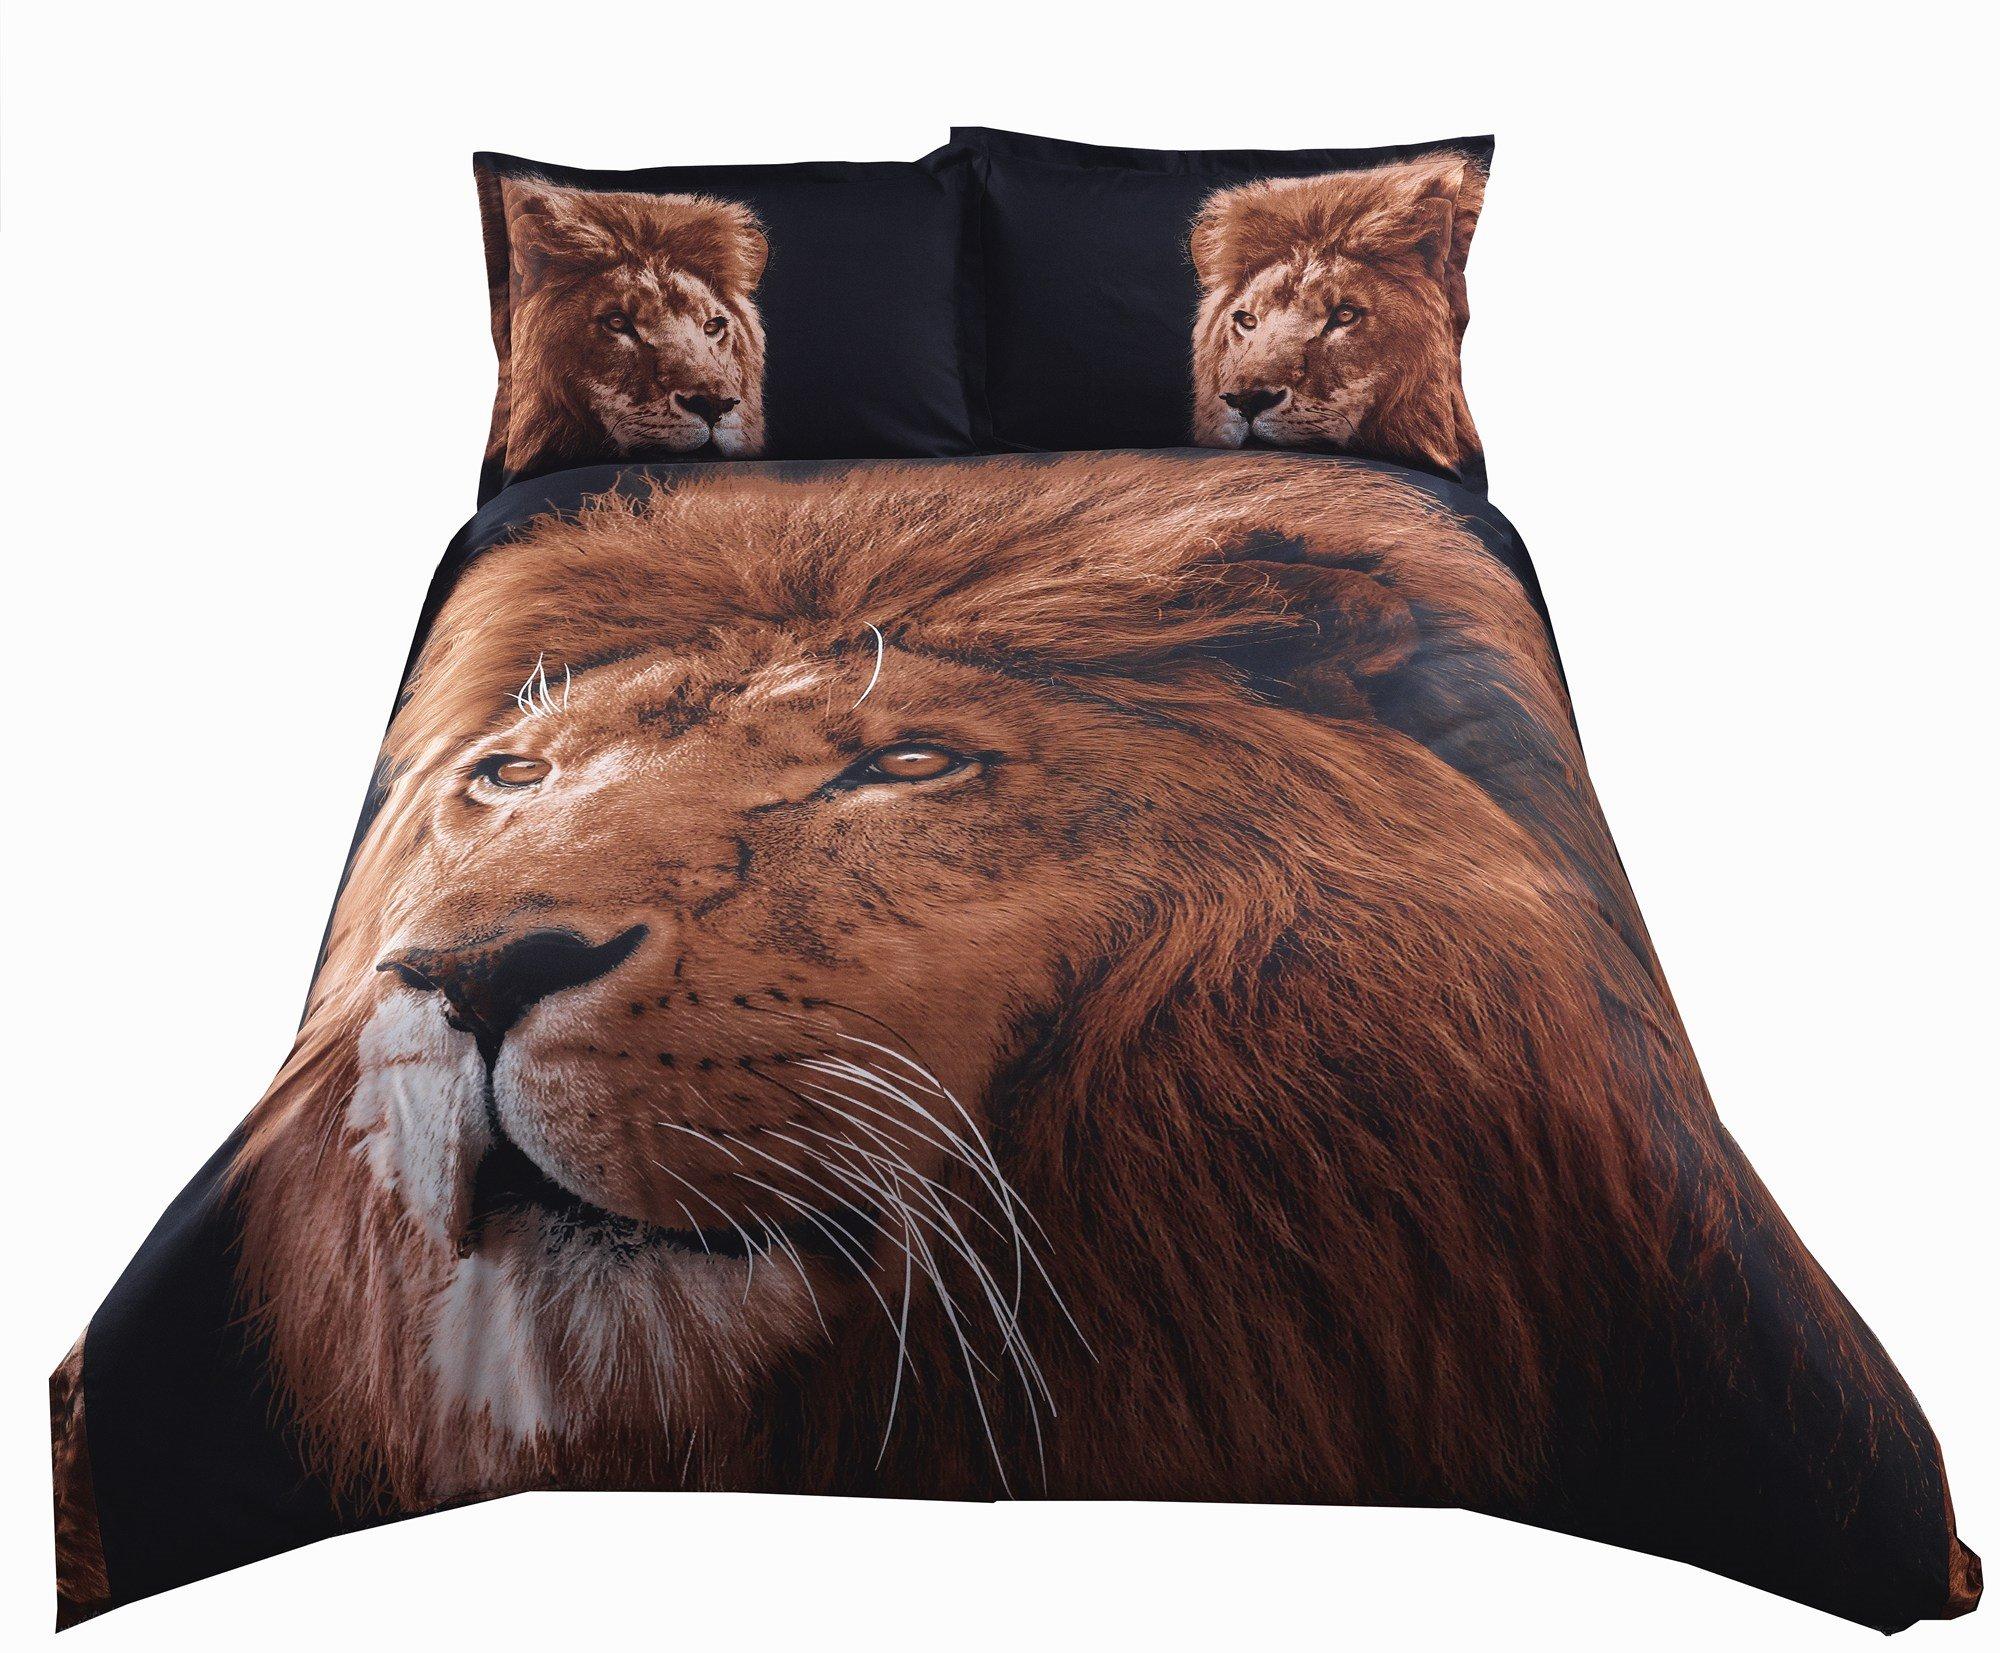 Inspiring Lion with Black Background Print 4-Piece Polyester 3D Duvet Cover Sets